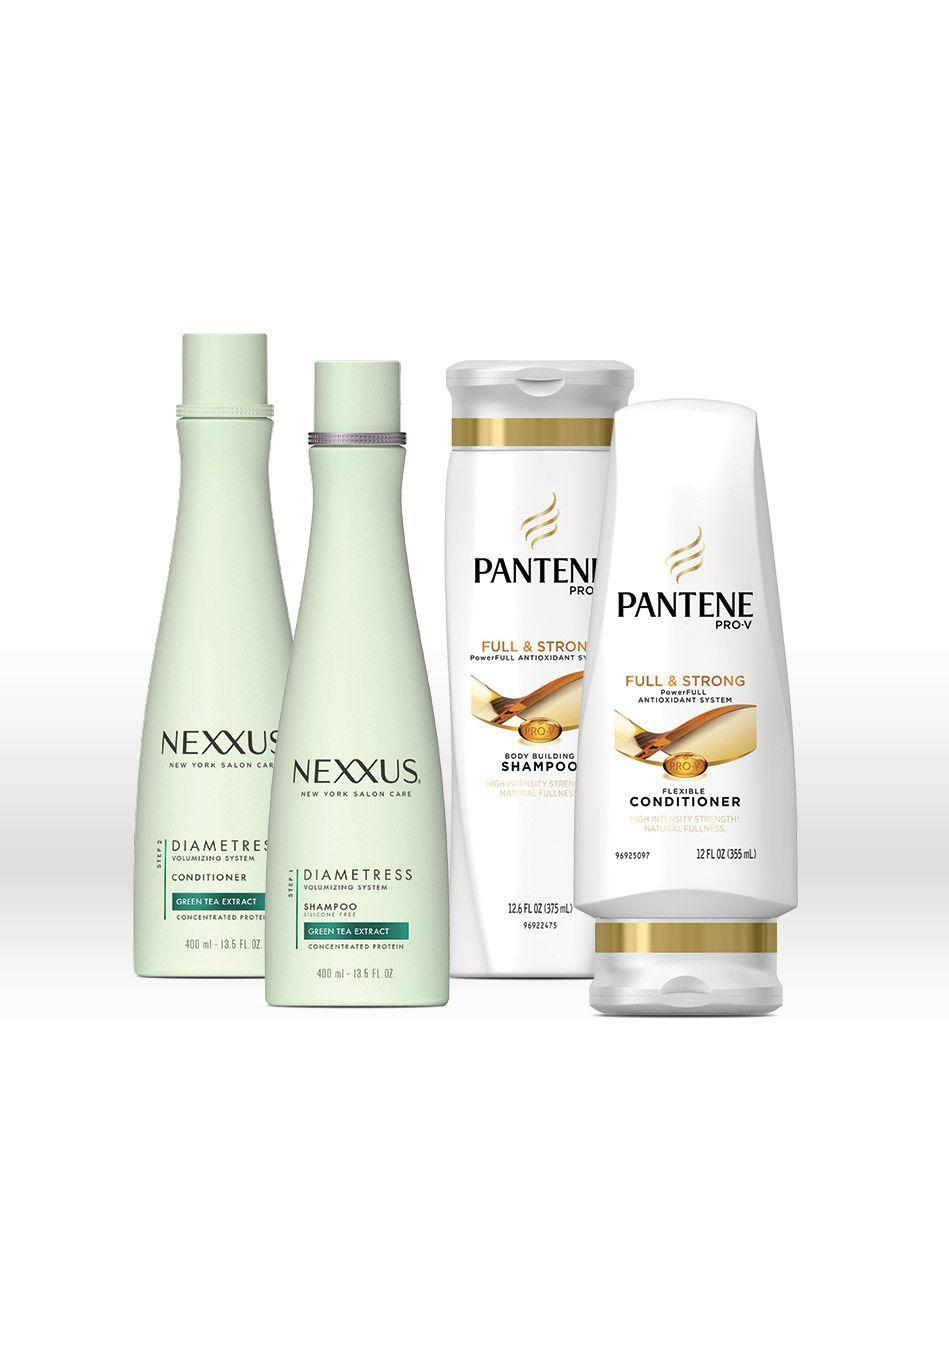 Best Shampoo for Straight Hair Nexxus New York Salon